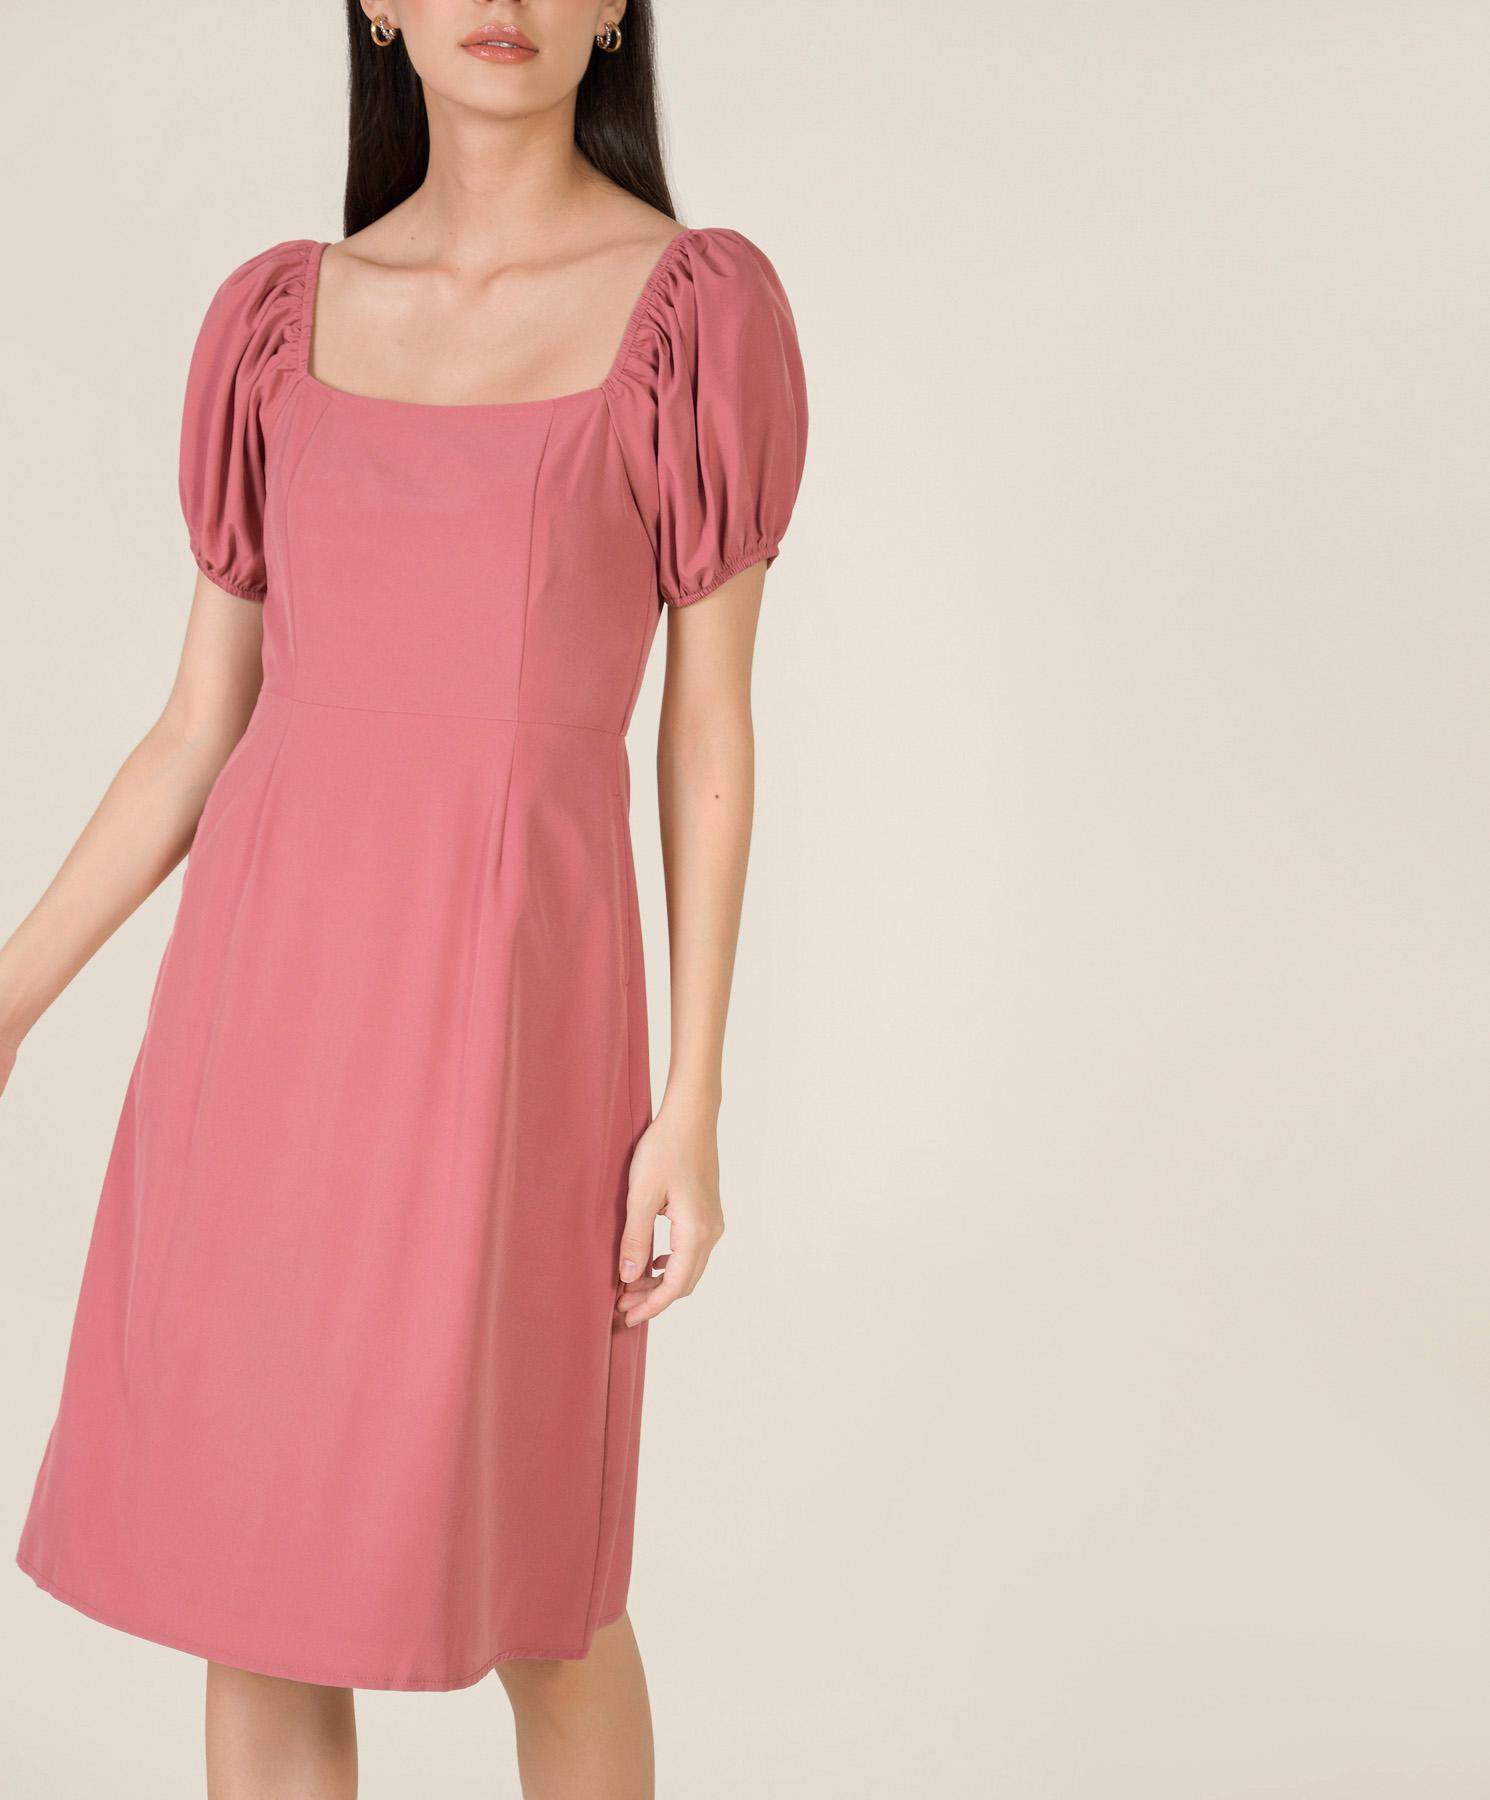 margaux-midi-dress-rose-1